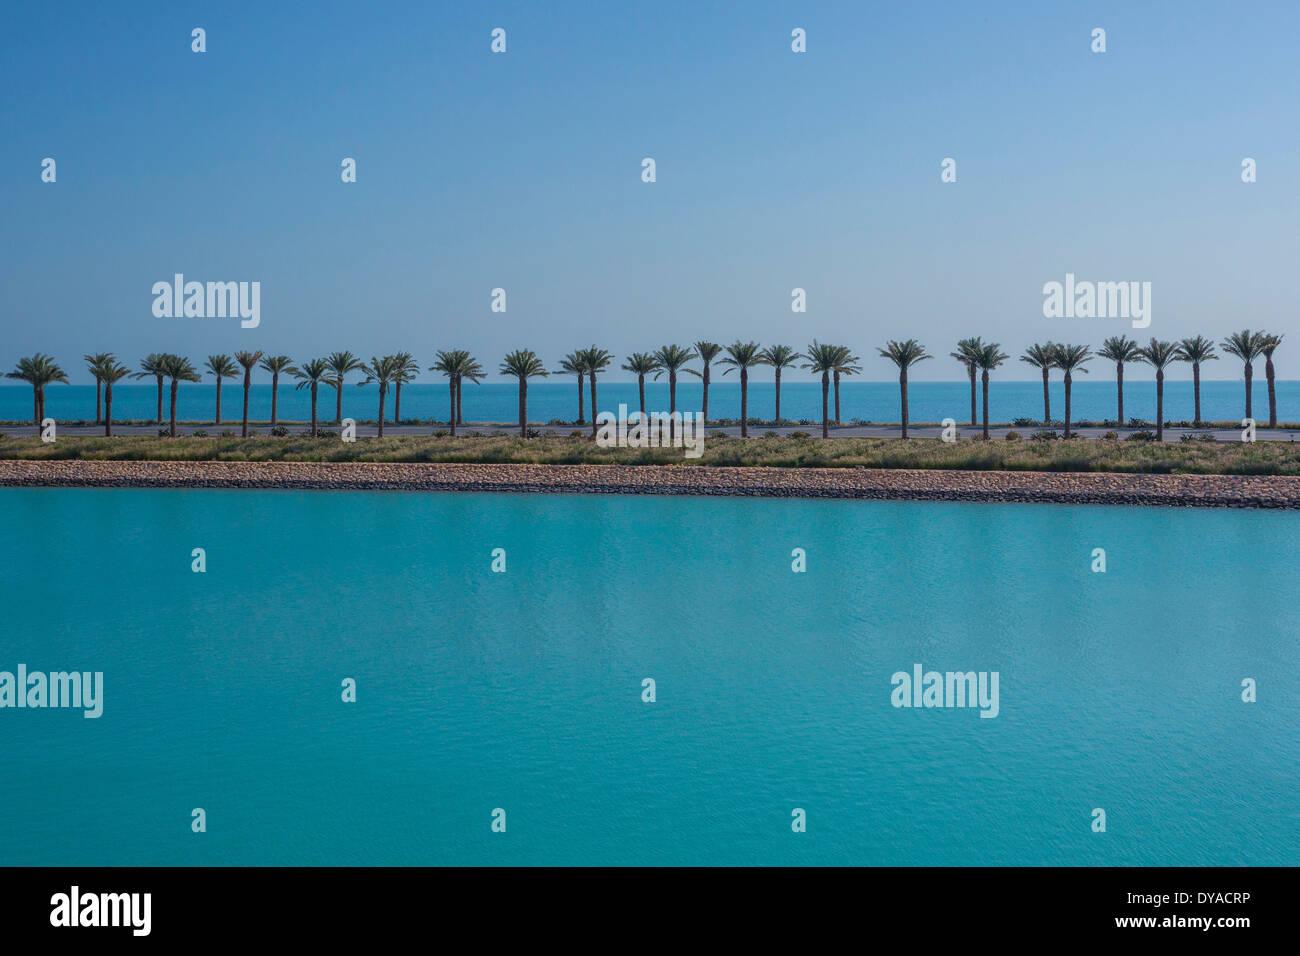 Doha, Qatar, Middle East, city, horizon, palm trees, road, sea, touristic, travel, highway - Stock Image